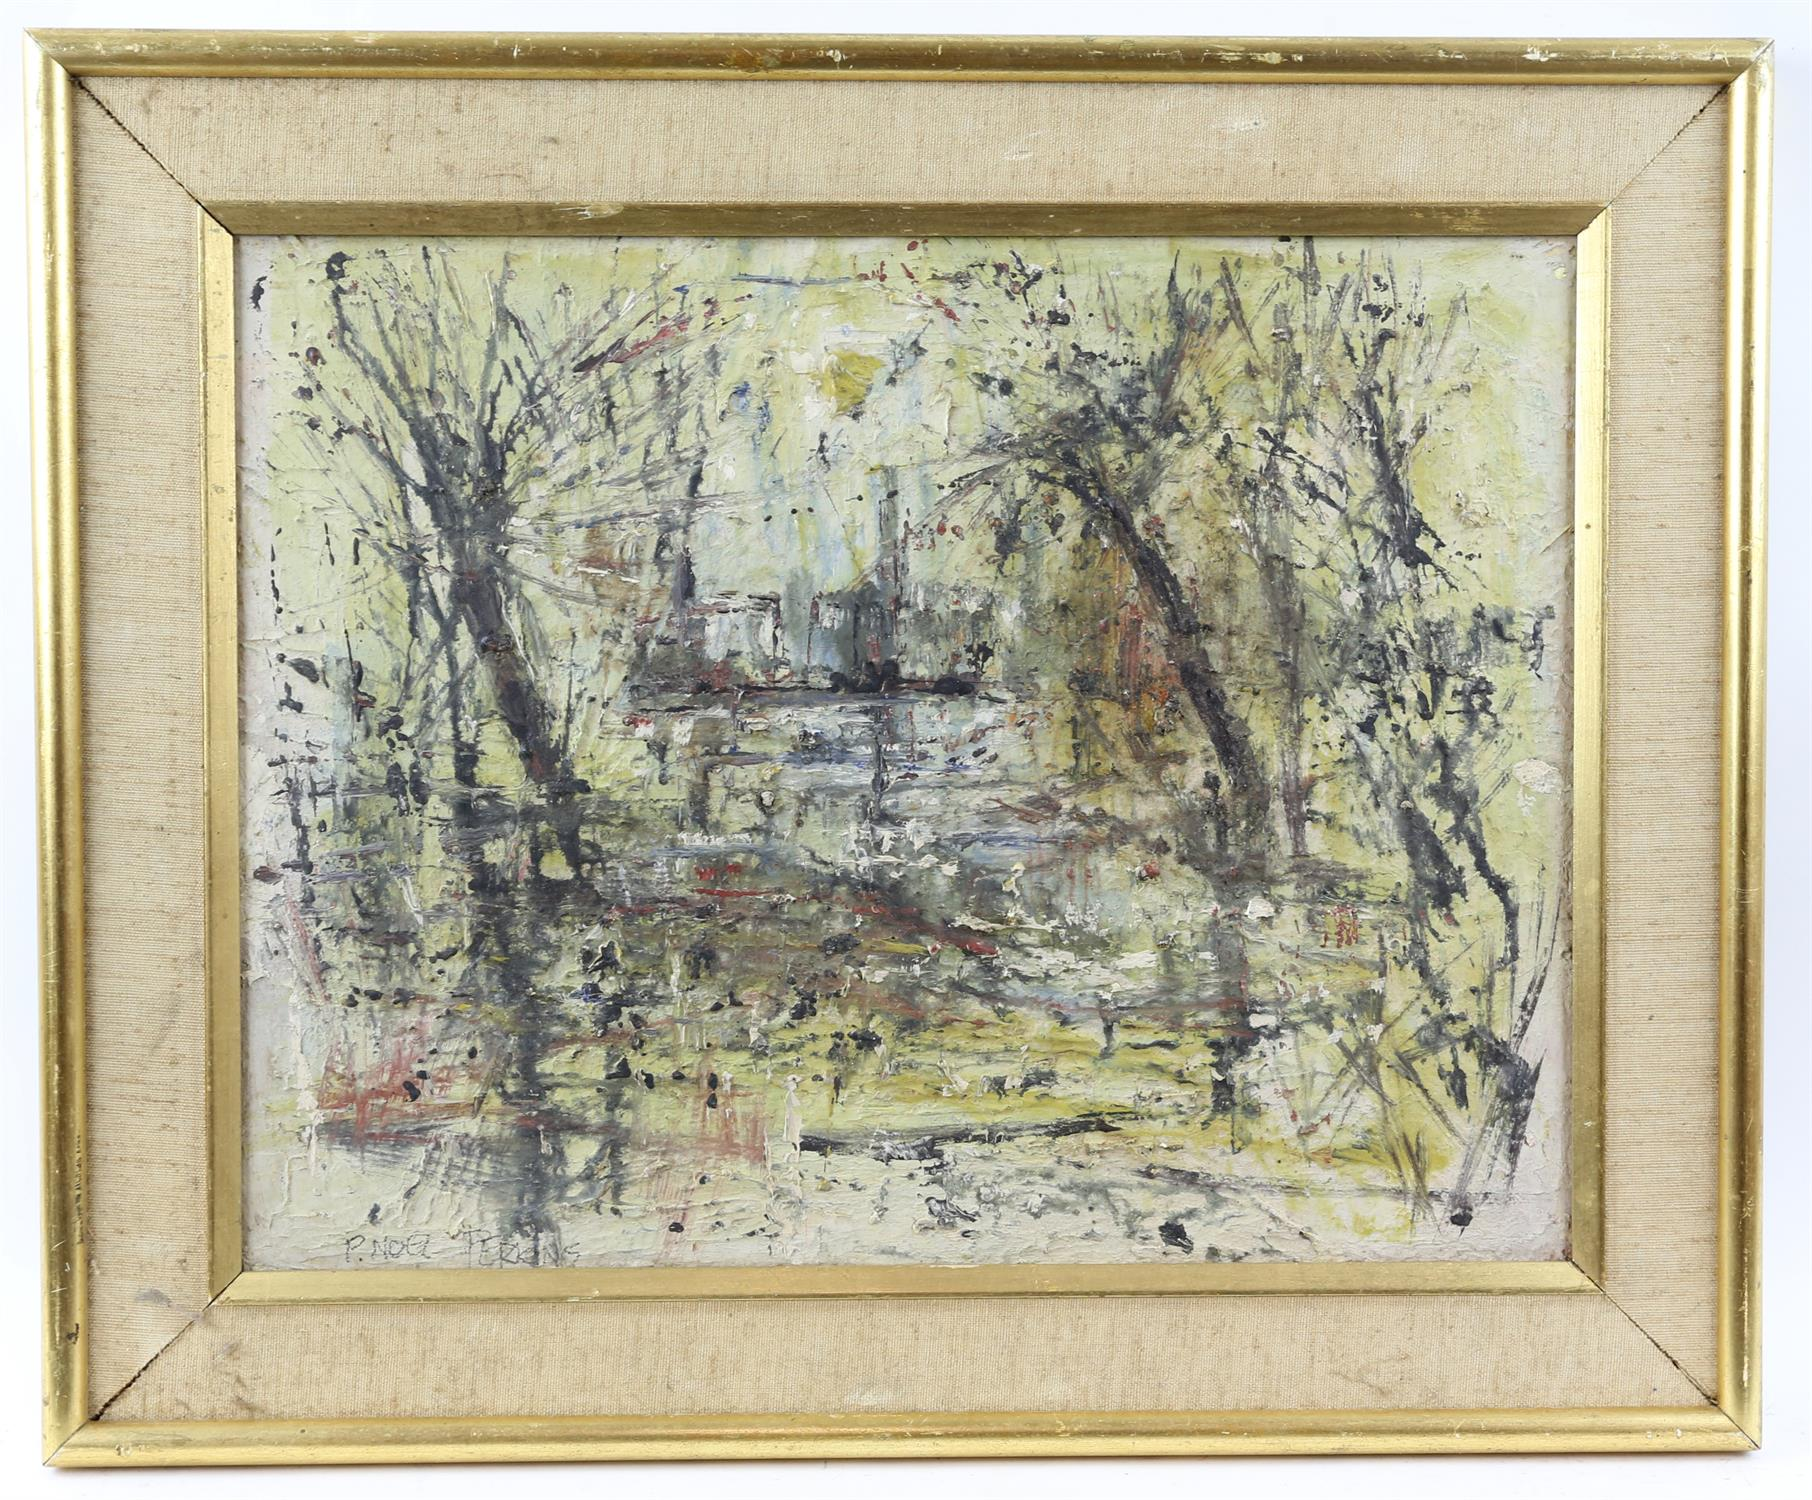 Peter Noel Perkins, abstract landscape. Oil on board. Signed lower left. Framed. Image size 33 x - Image 2 of 7